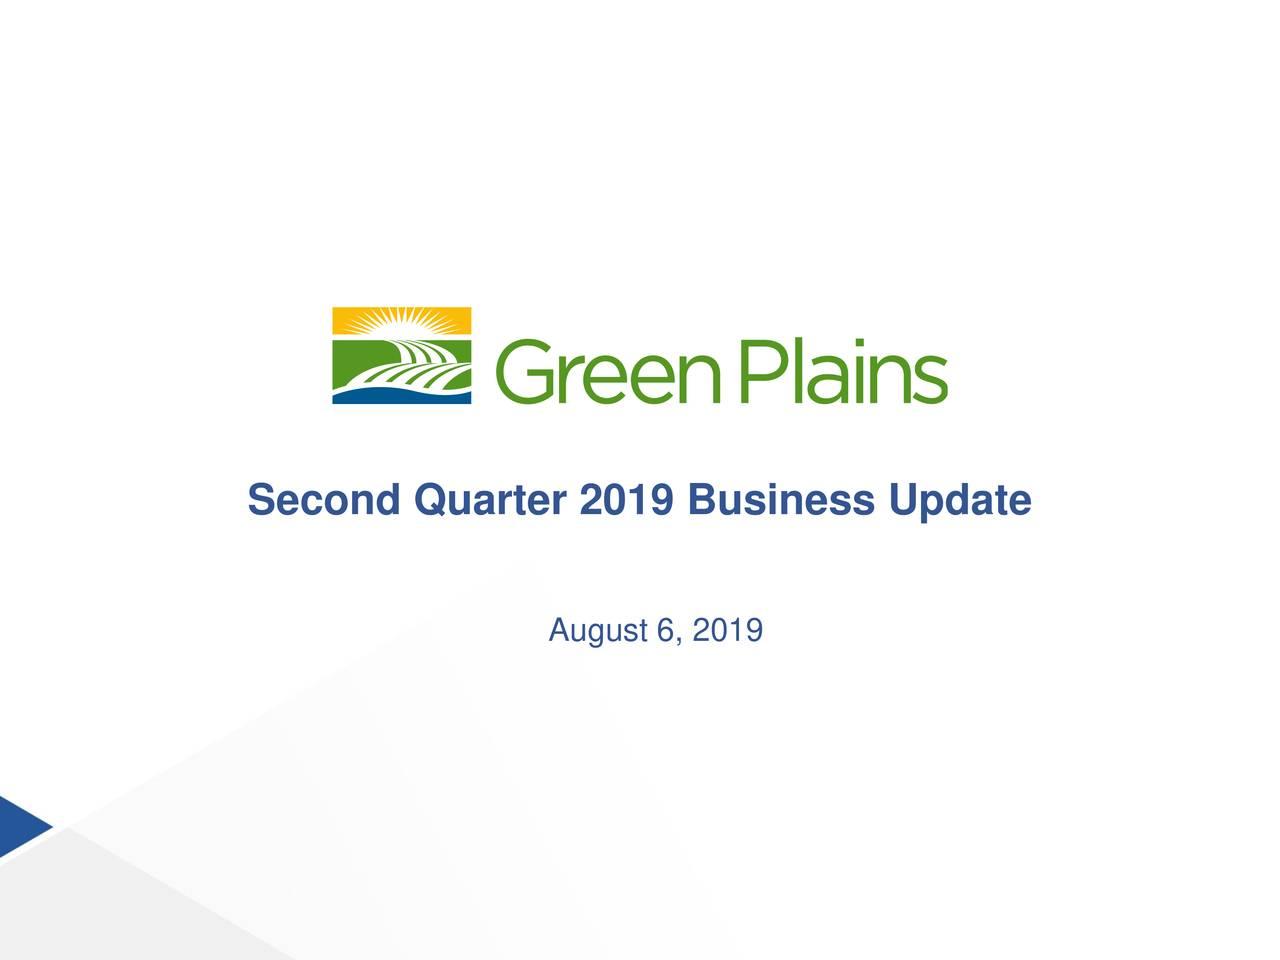 Second Quarter 2019 Business Update